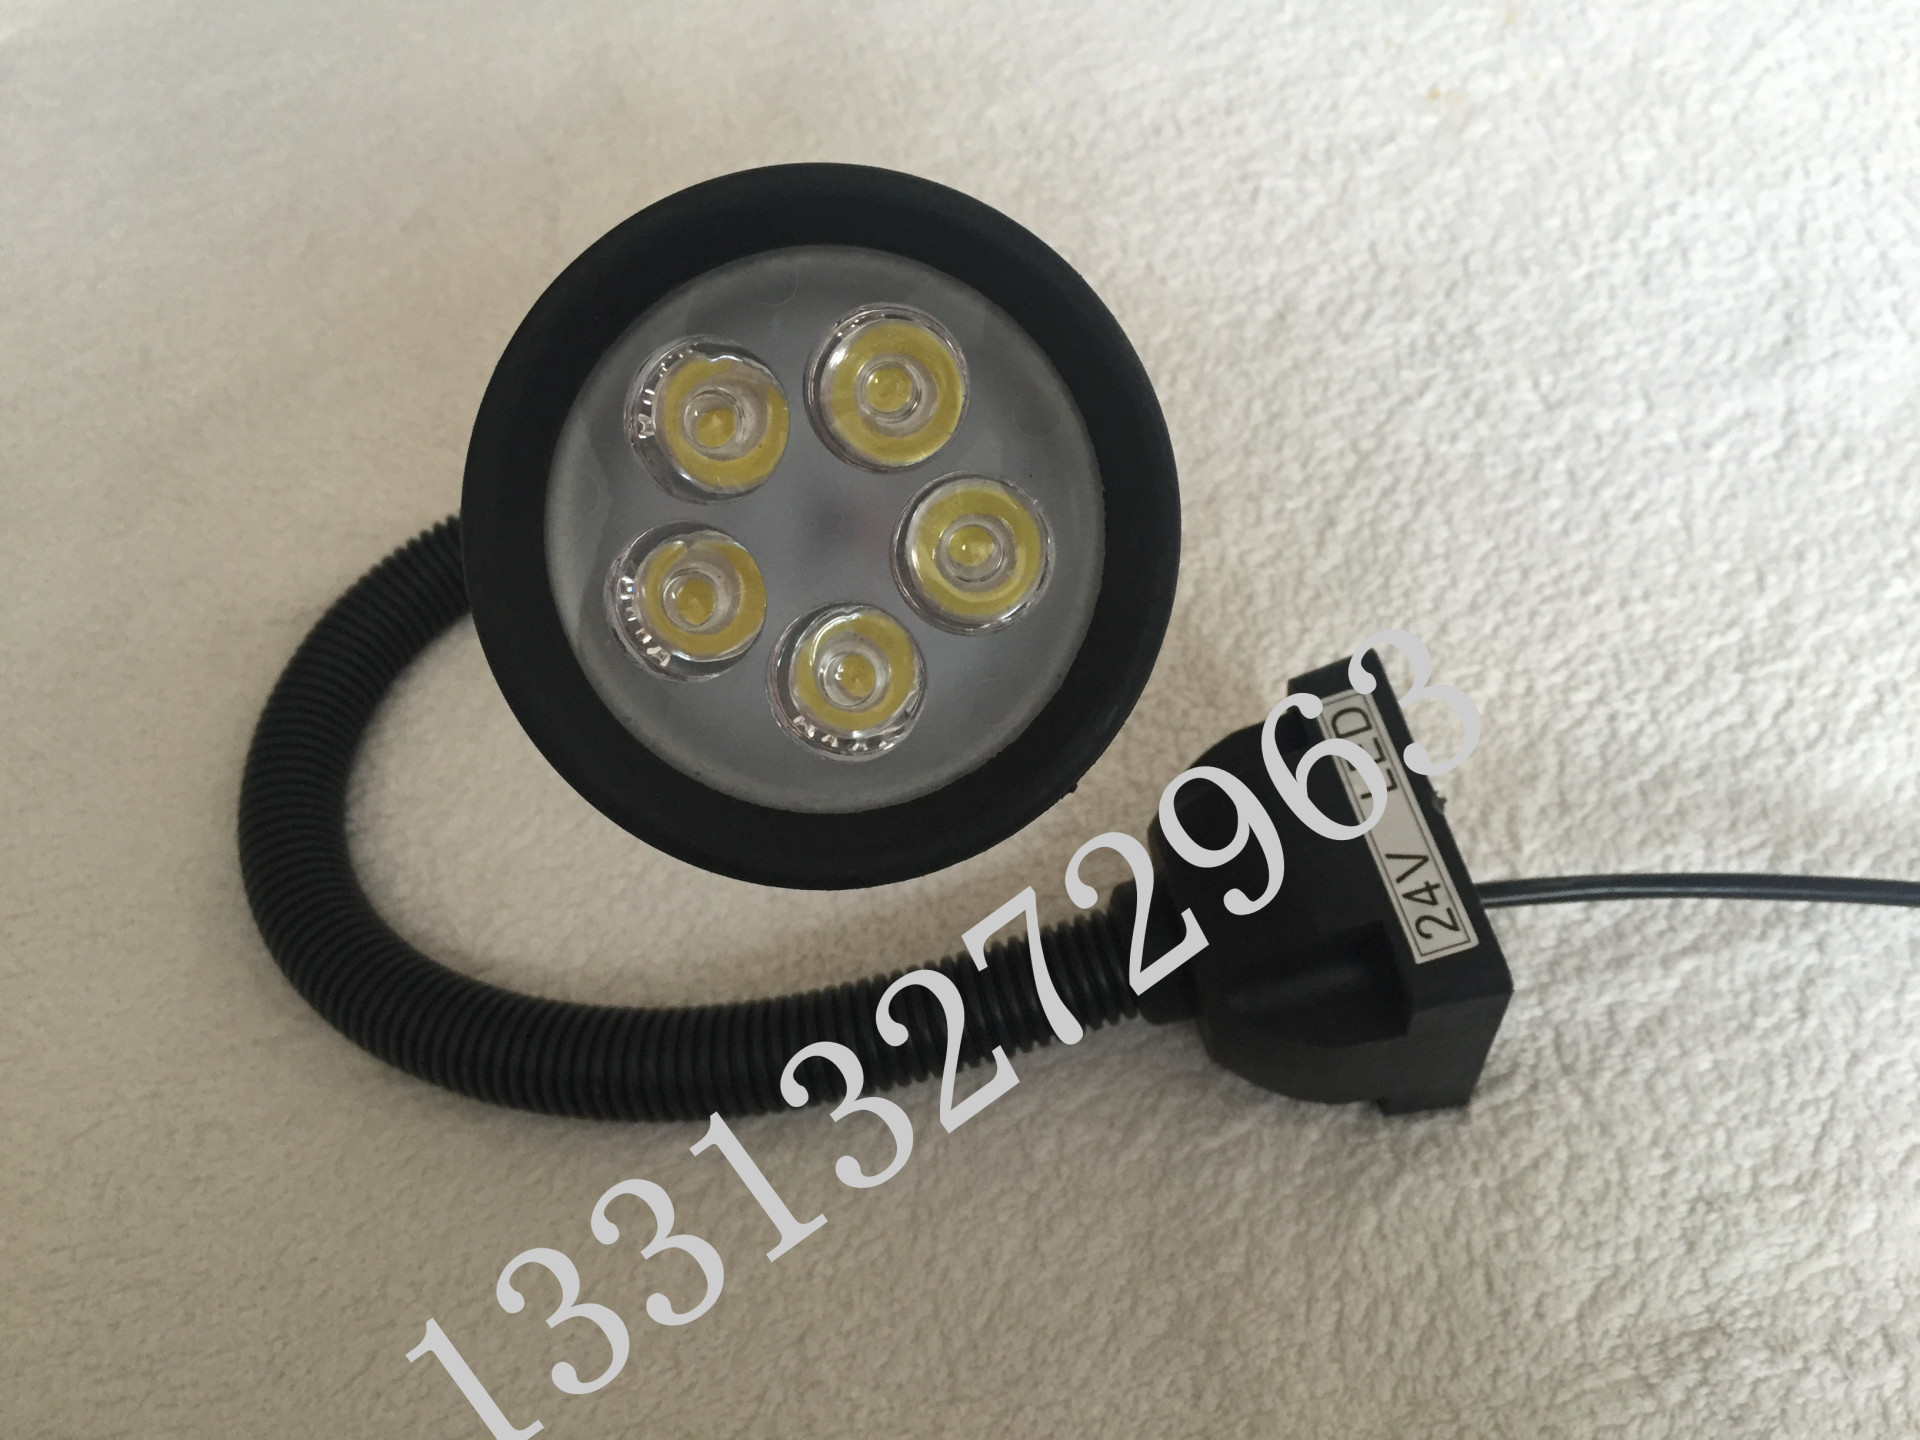 220VLED分散片照明灯 50D软管万向小方座工作灯 5珠工作灯 LED机床工作灯示例图16